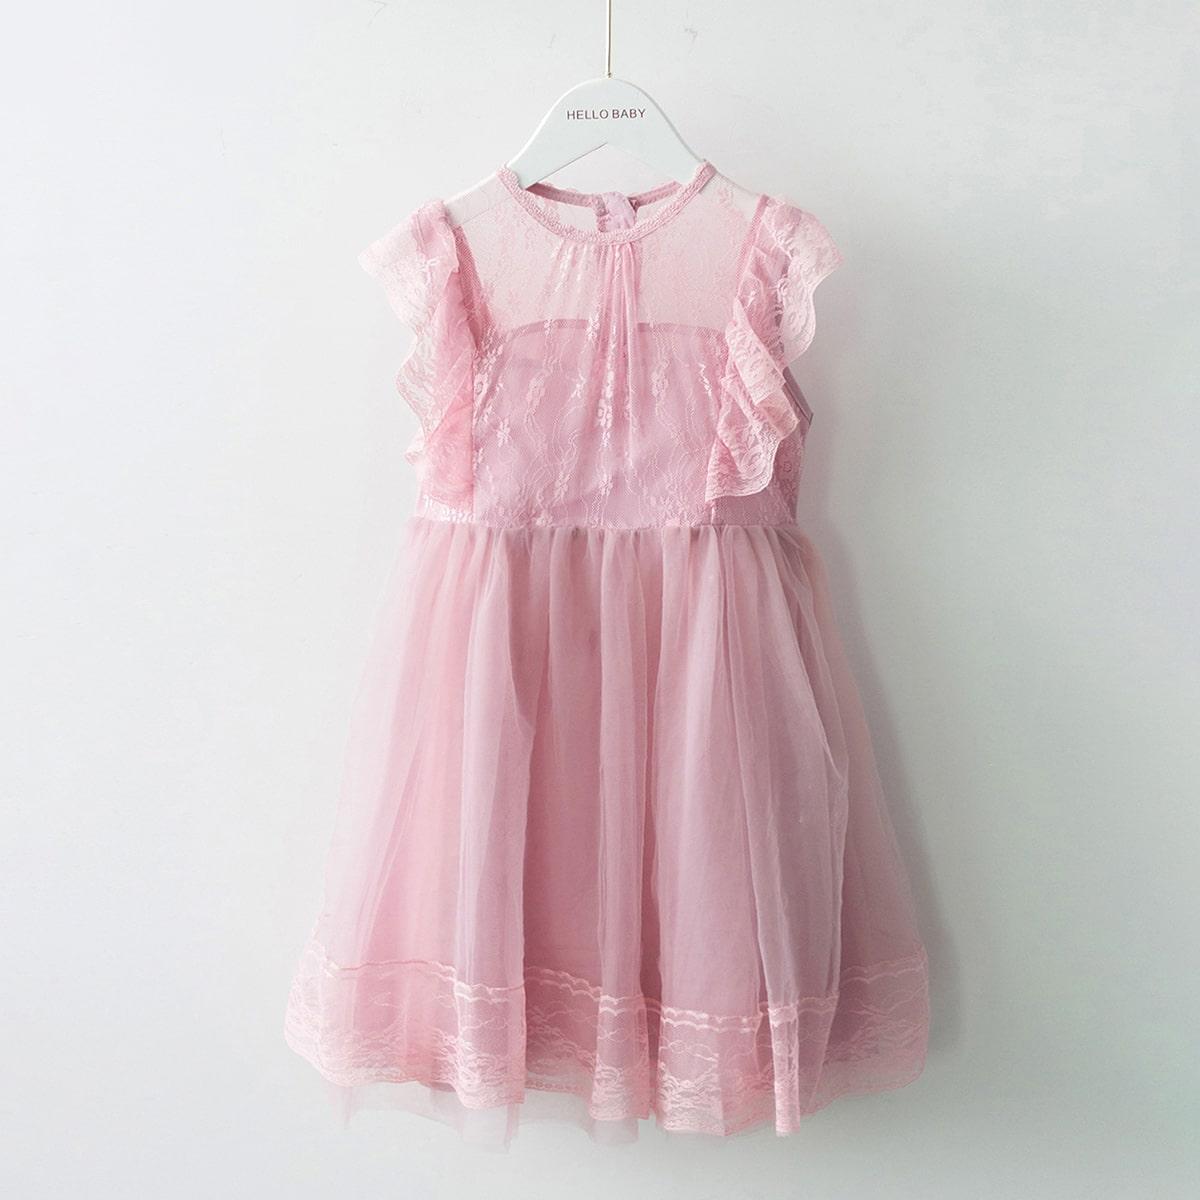 Girls Contrast Lace Ruffle Trim Zipper Back Smock Dress